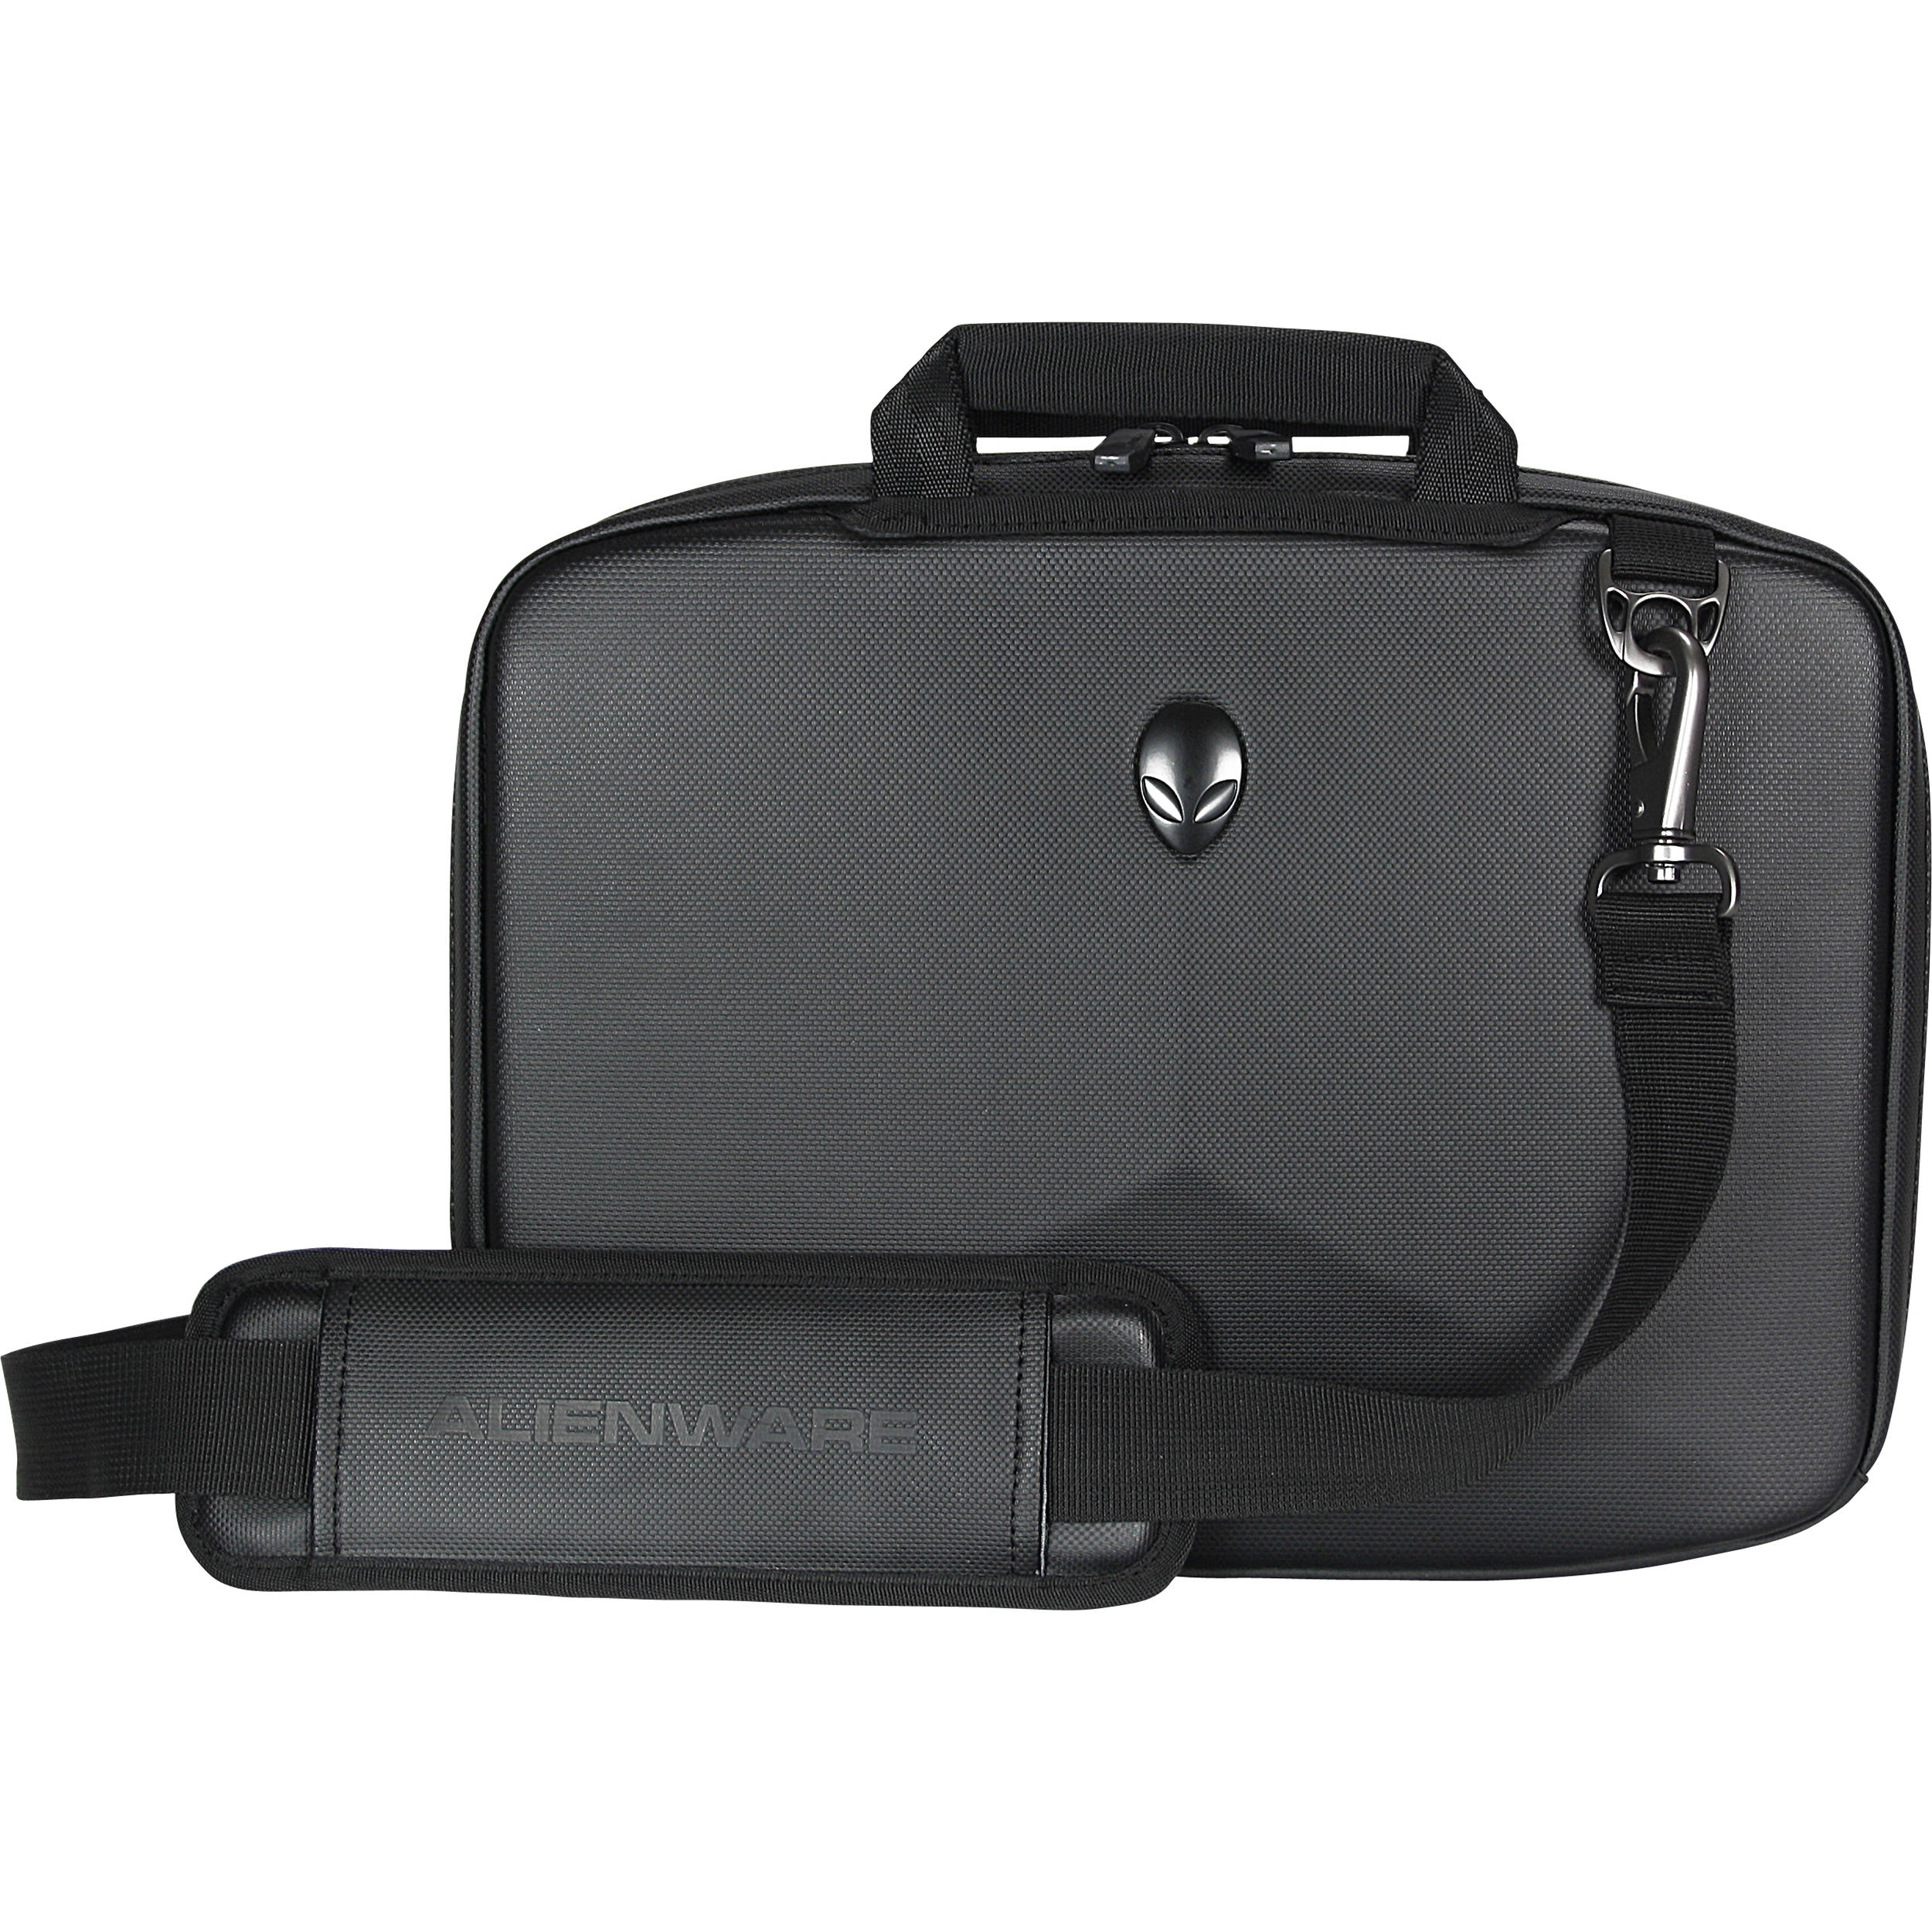 "Notebook Carrying Case Alienware Orion Messenger 17.3/"" Laptop Travel Bag Black"